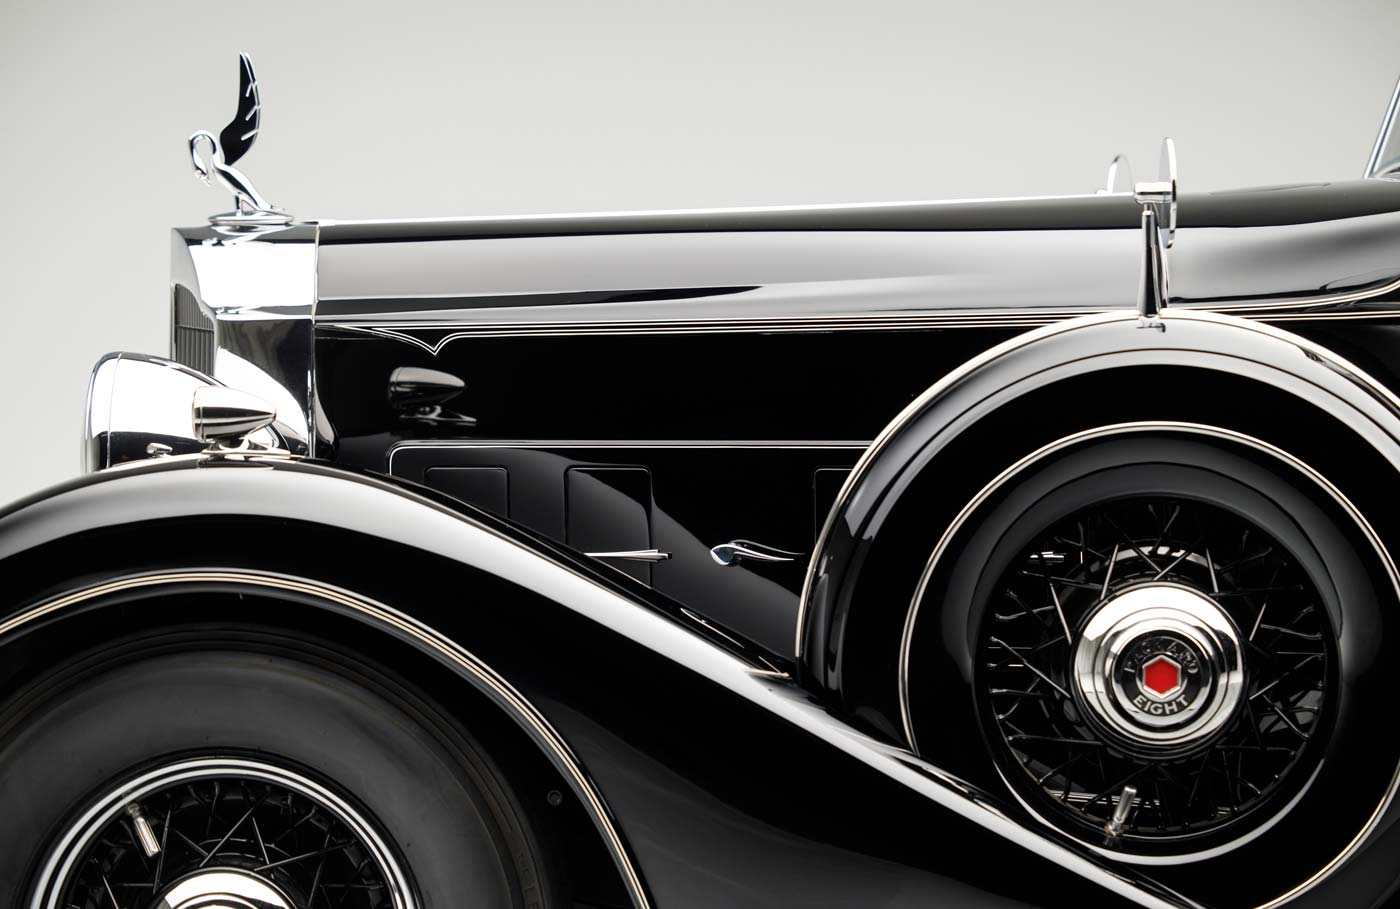 1934 Packard Eight 1101 Series Convertible Sedan - The JBS Collection